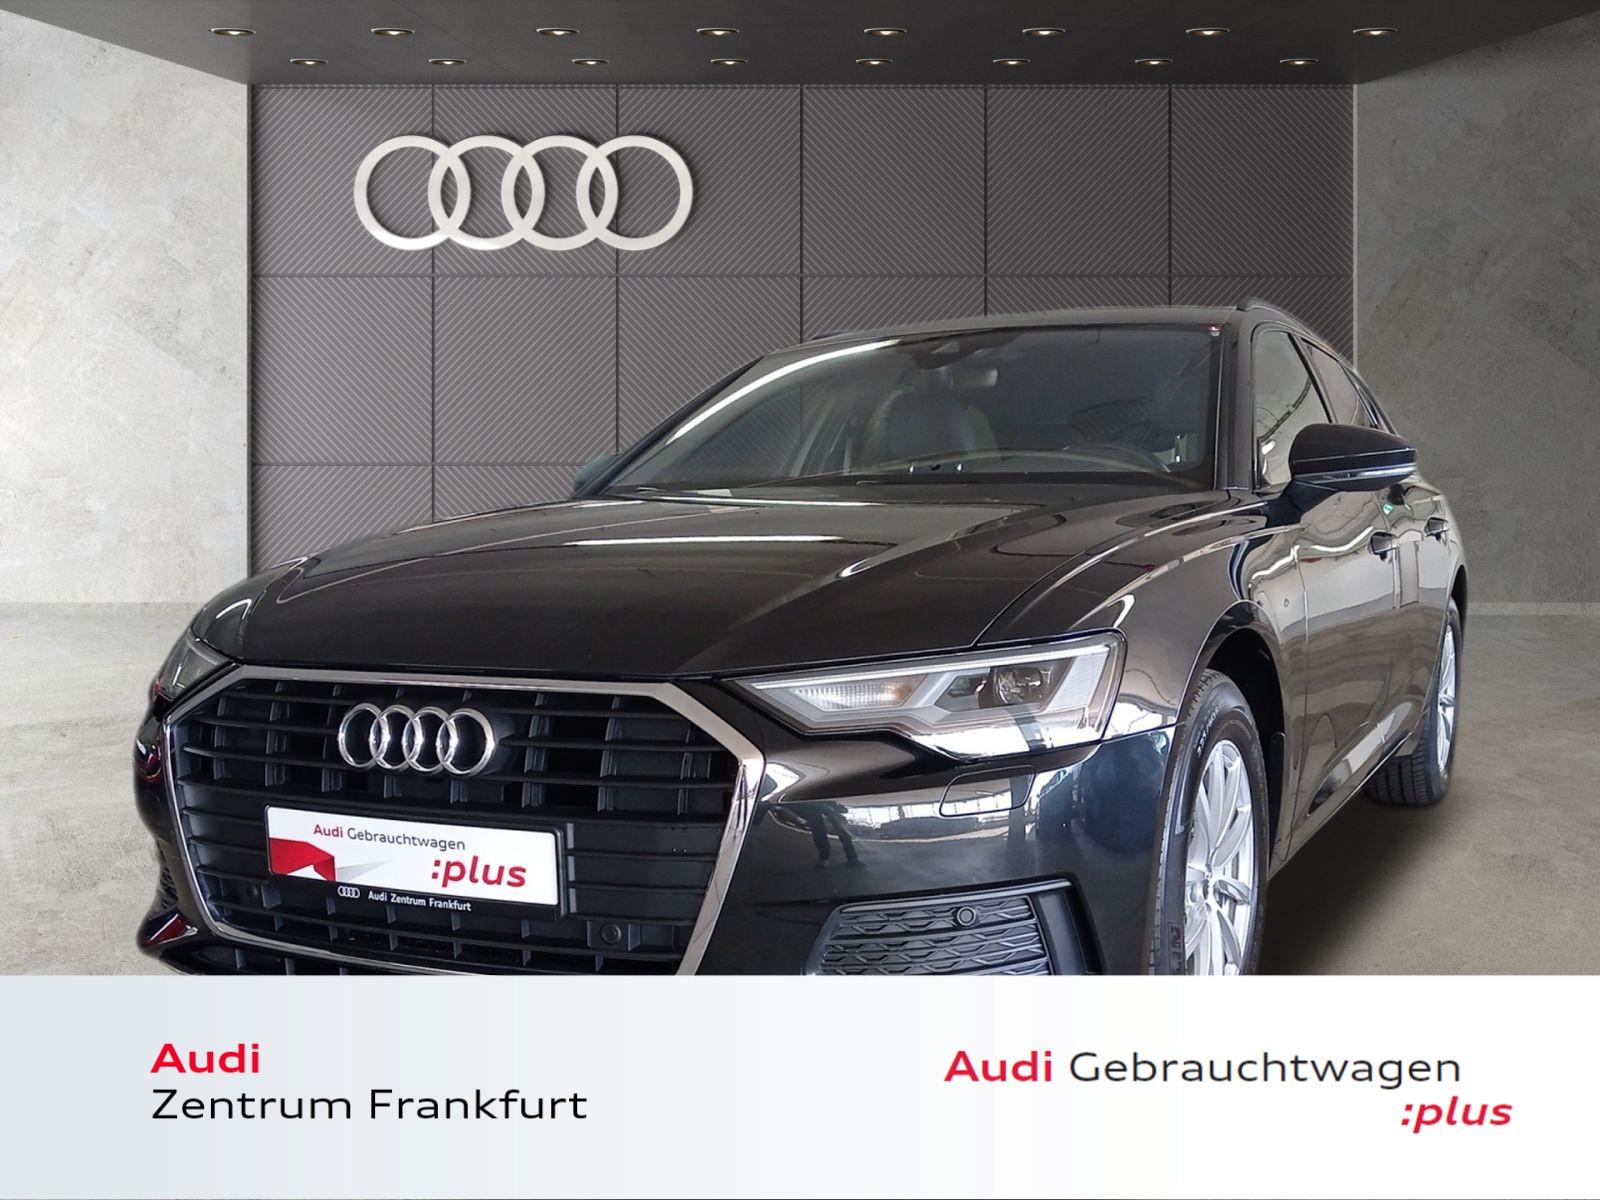 Audi A6 Avant 40 TDI S tronic LED Navi Tempomat PDC Sitzheizung, Jahr 2019, Diesel